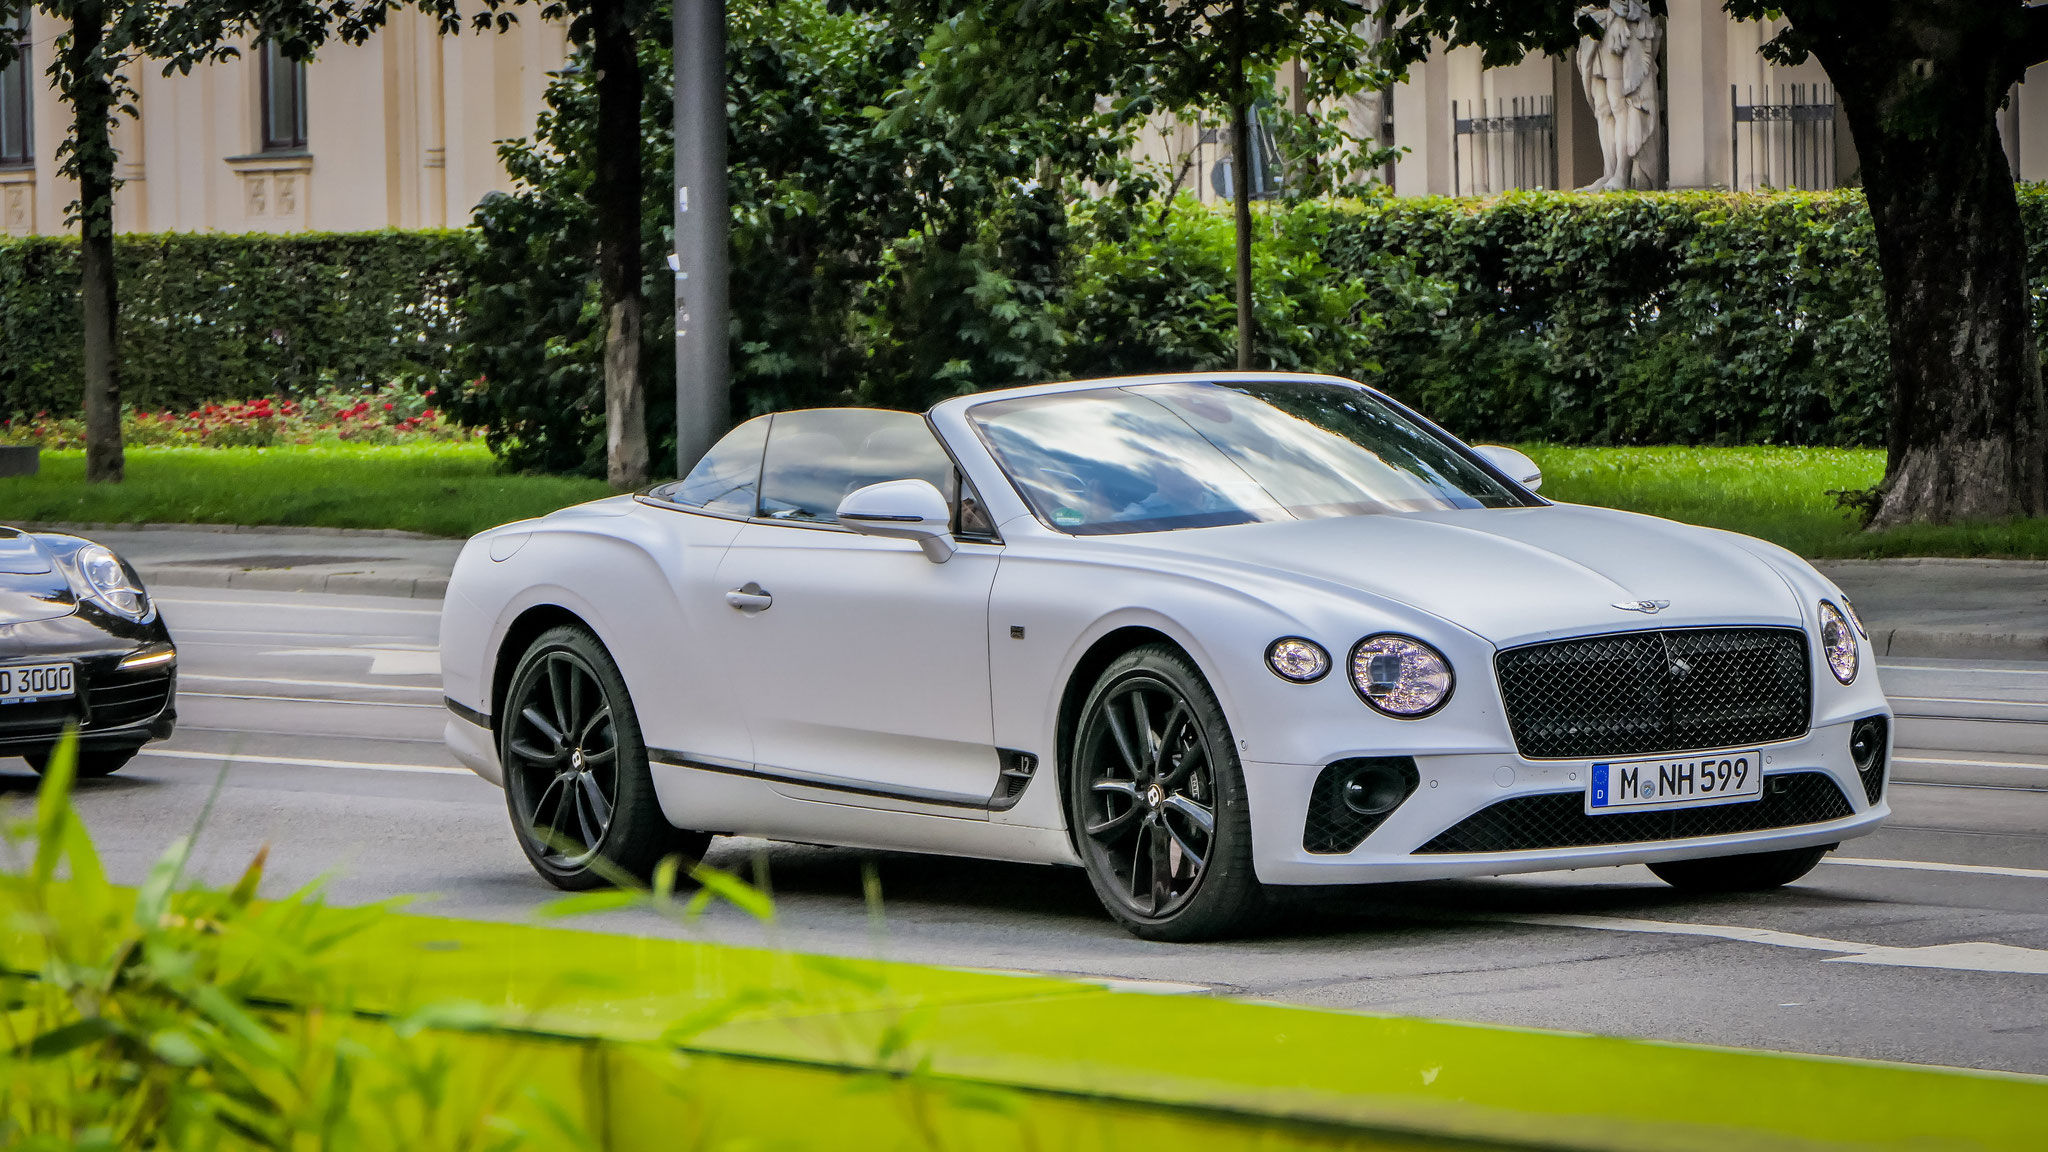 Bentley Continental GTC - M-NH-599